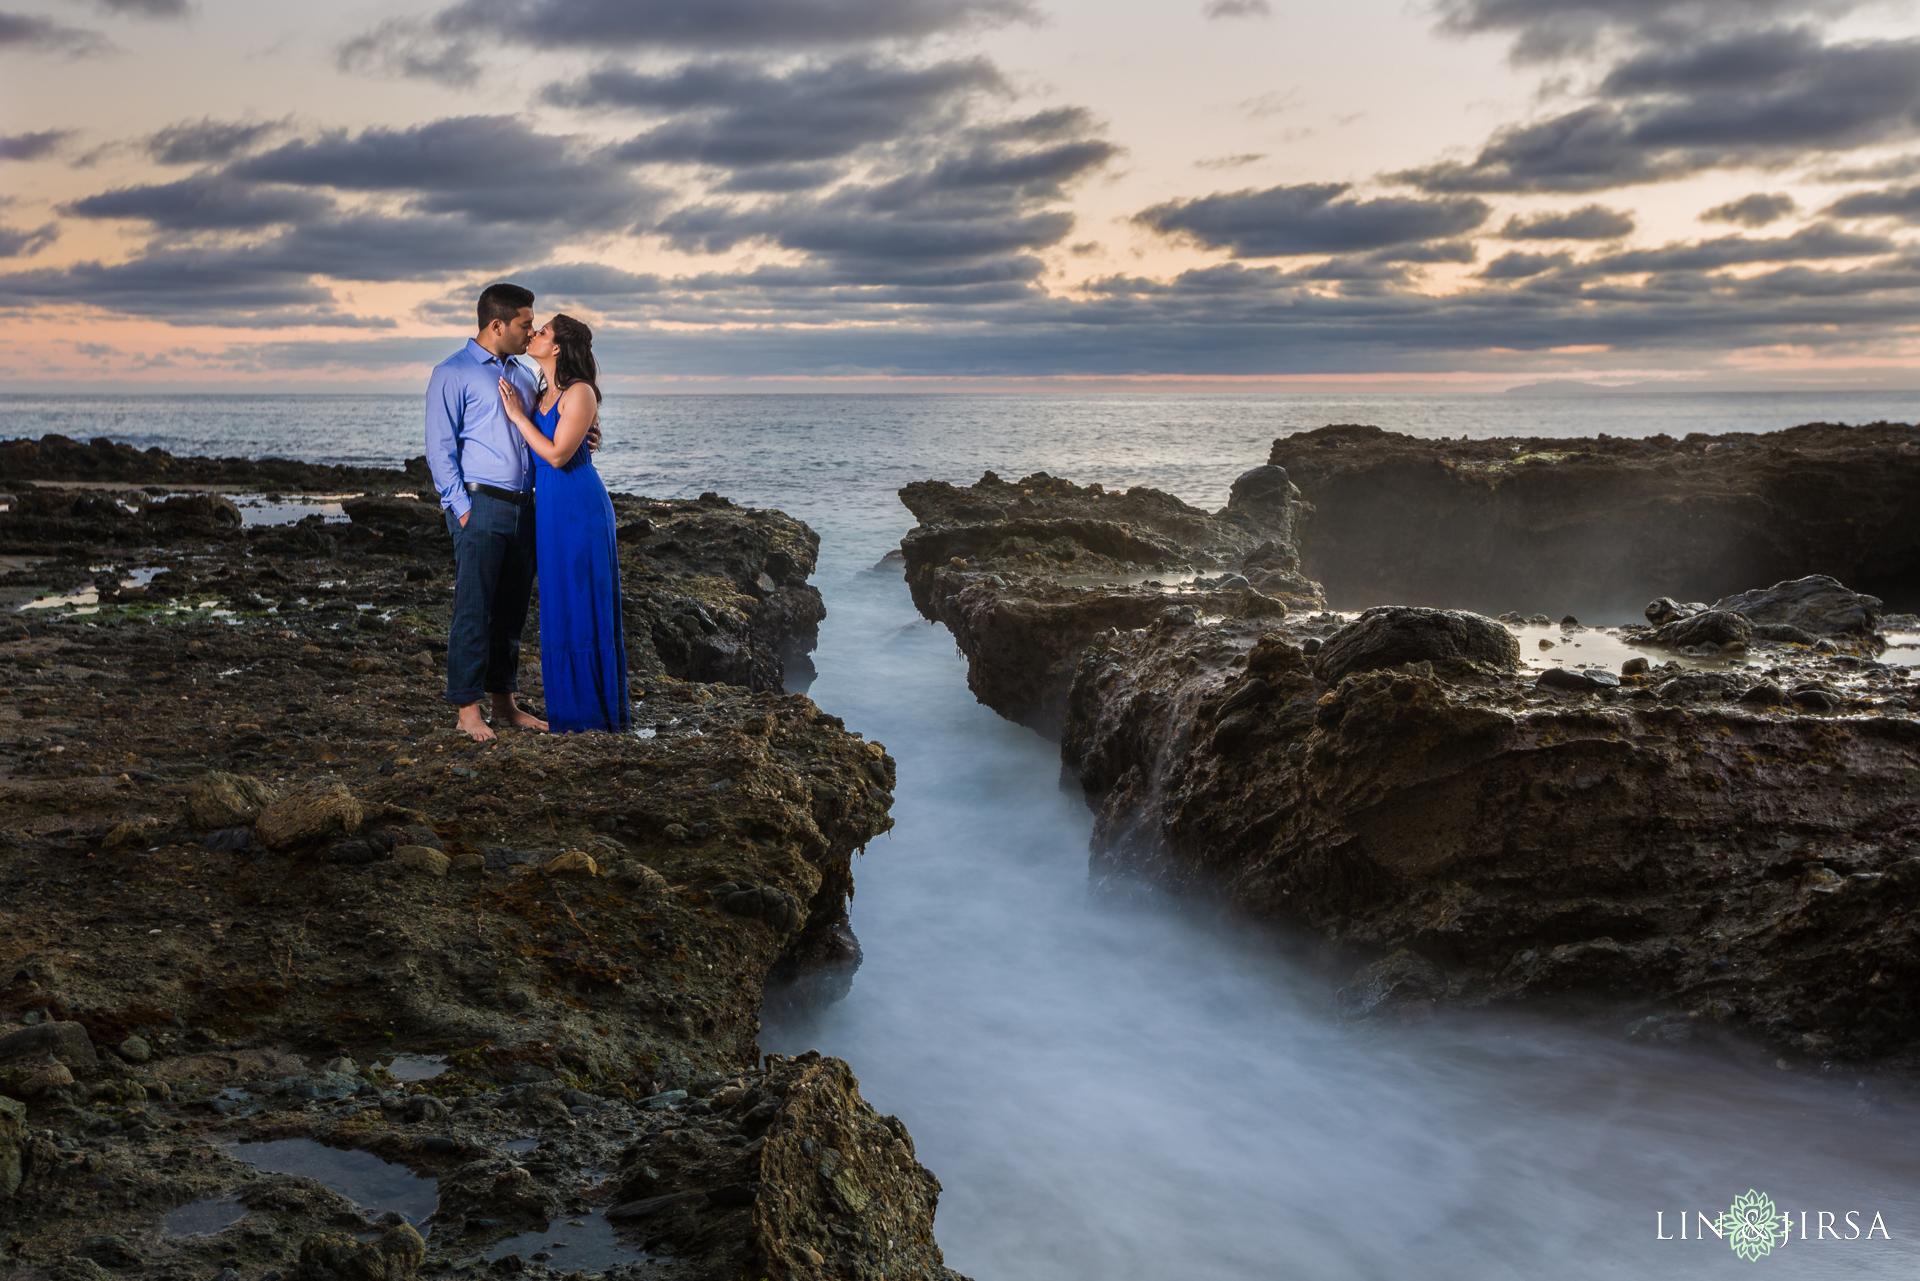 20-Mission-San-Juan-Capistrano-Engagement-Photography